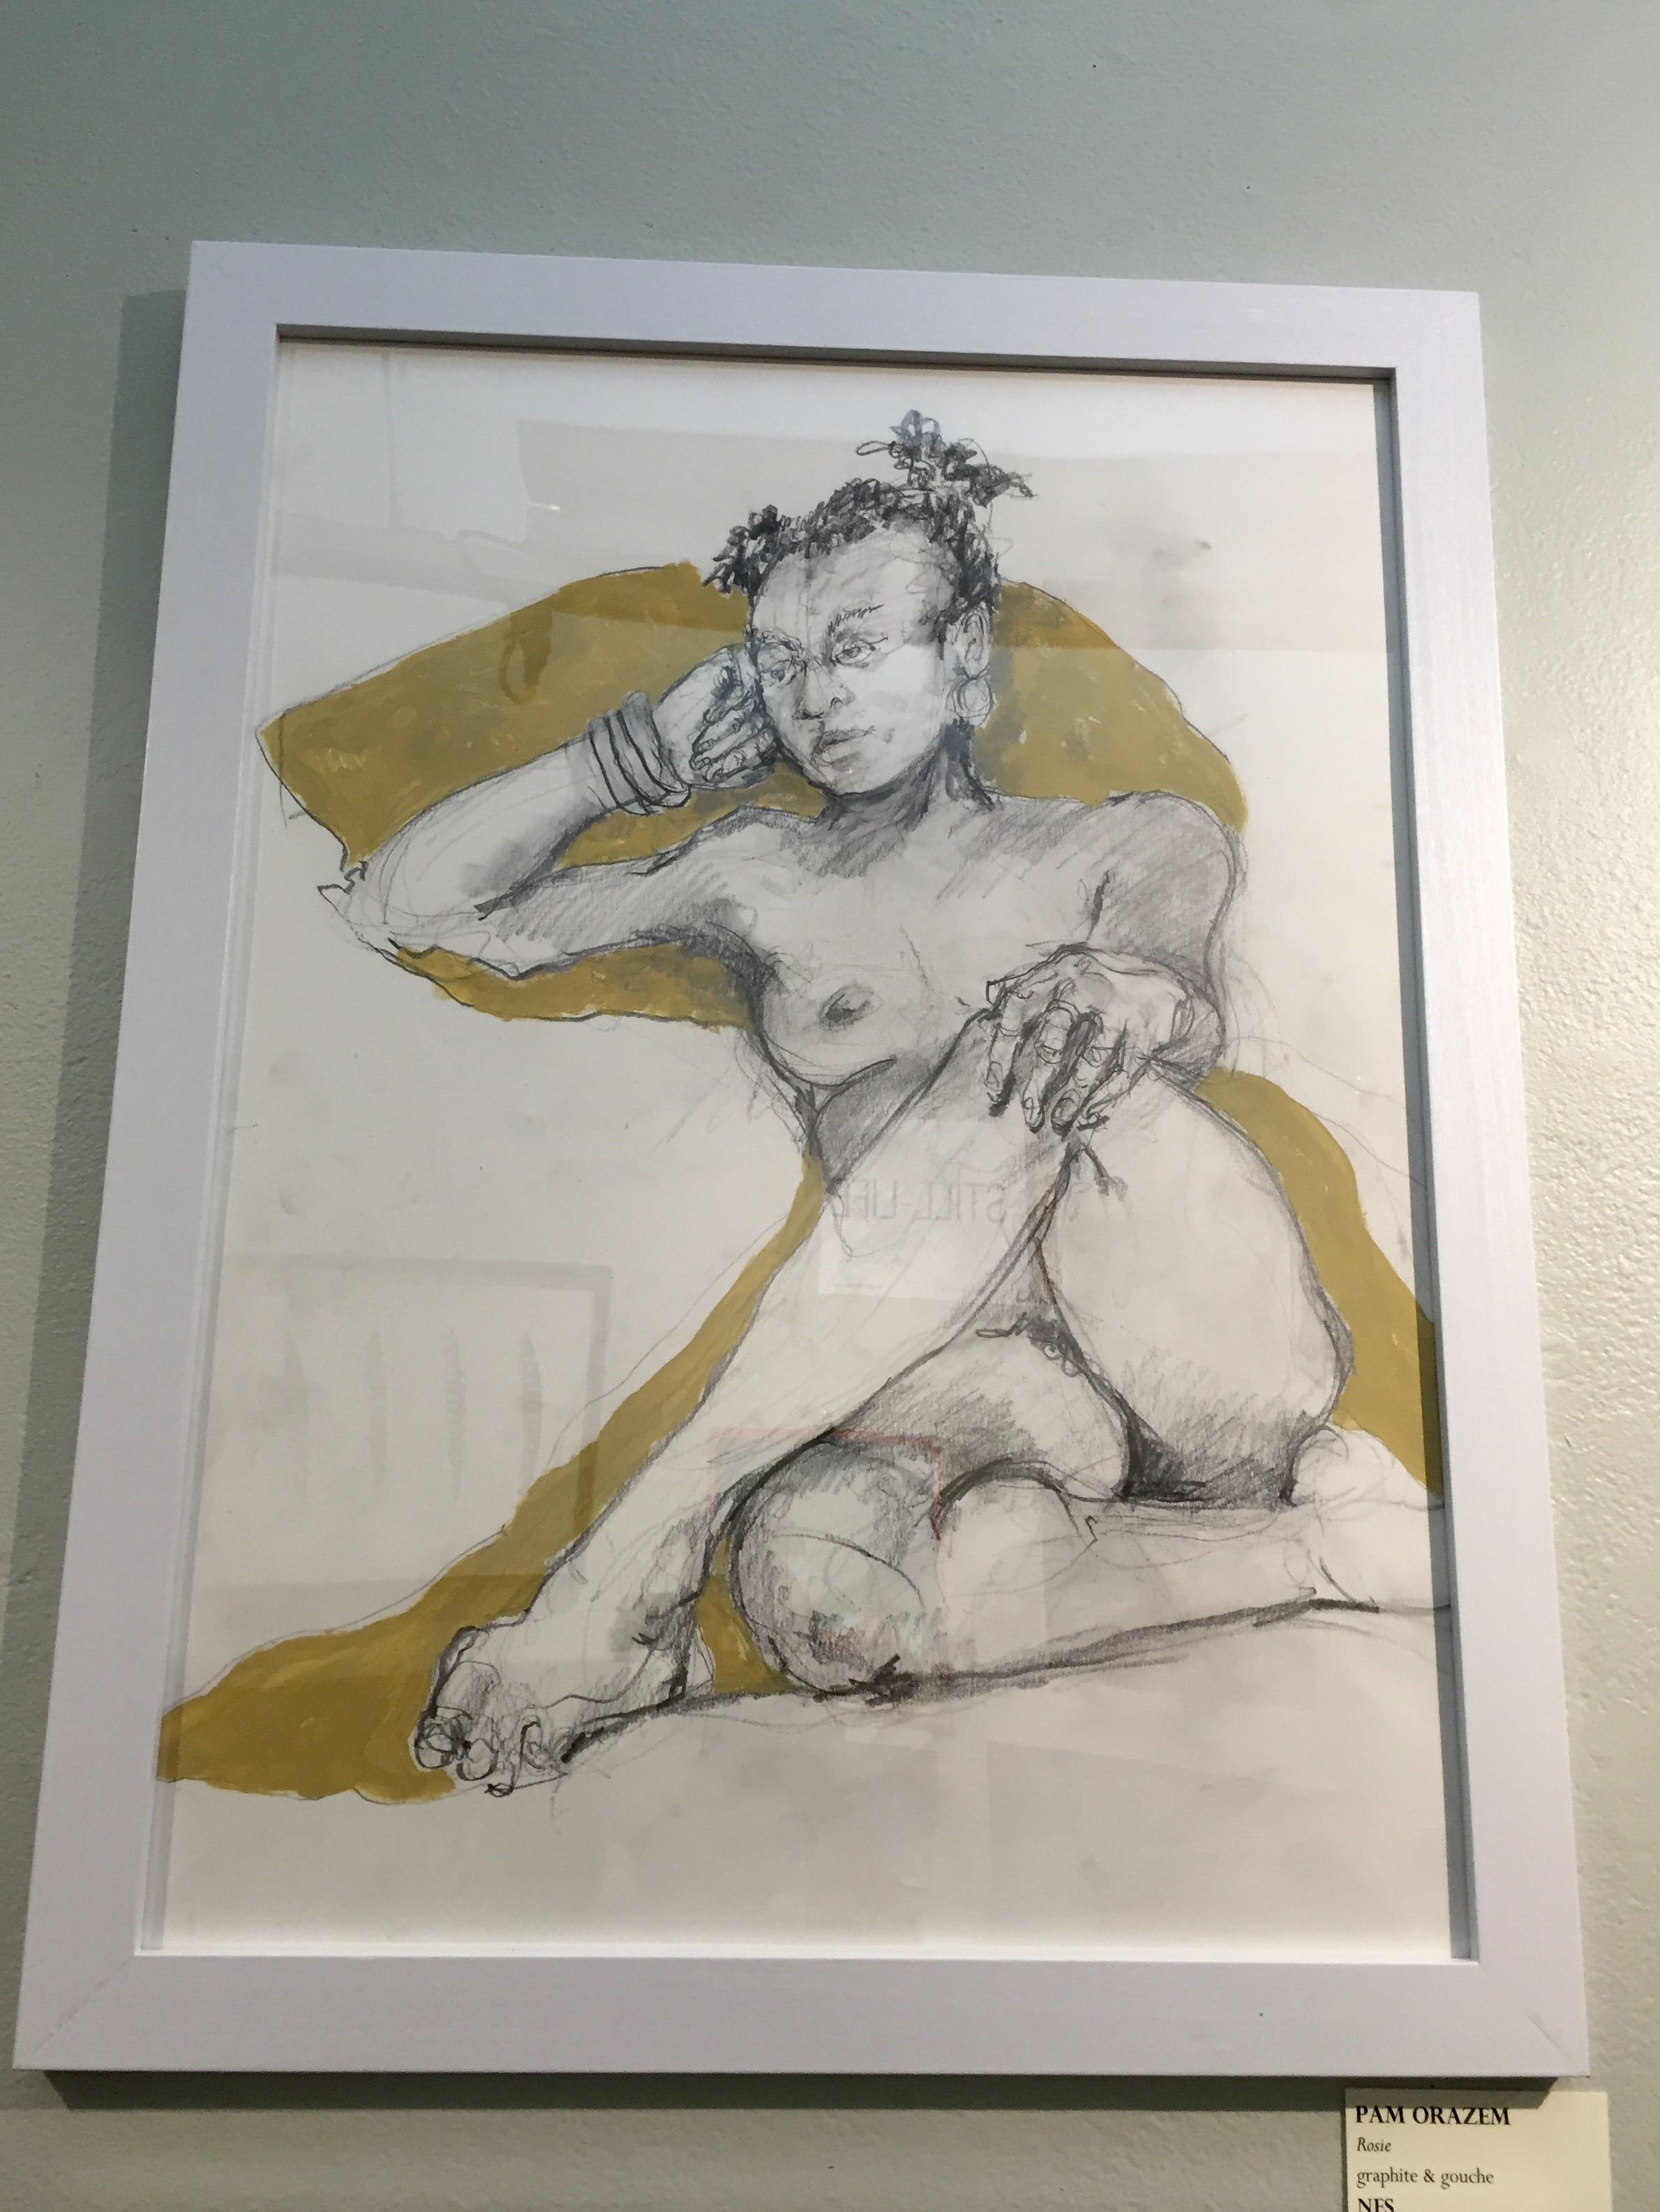 Artist: Pam Orazem